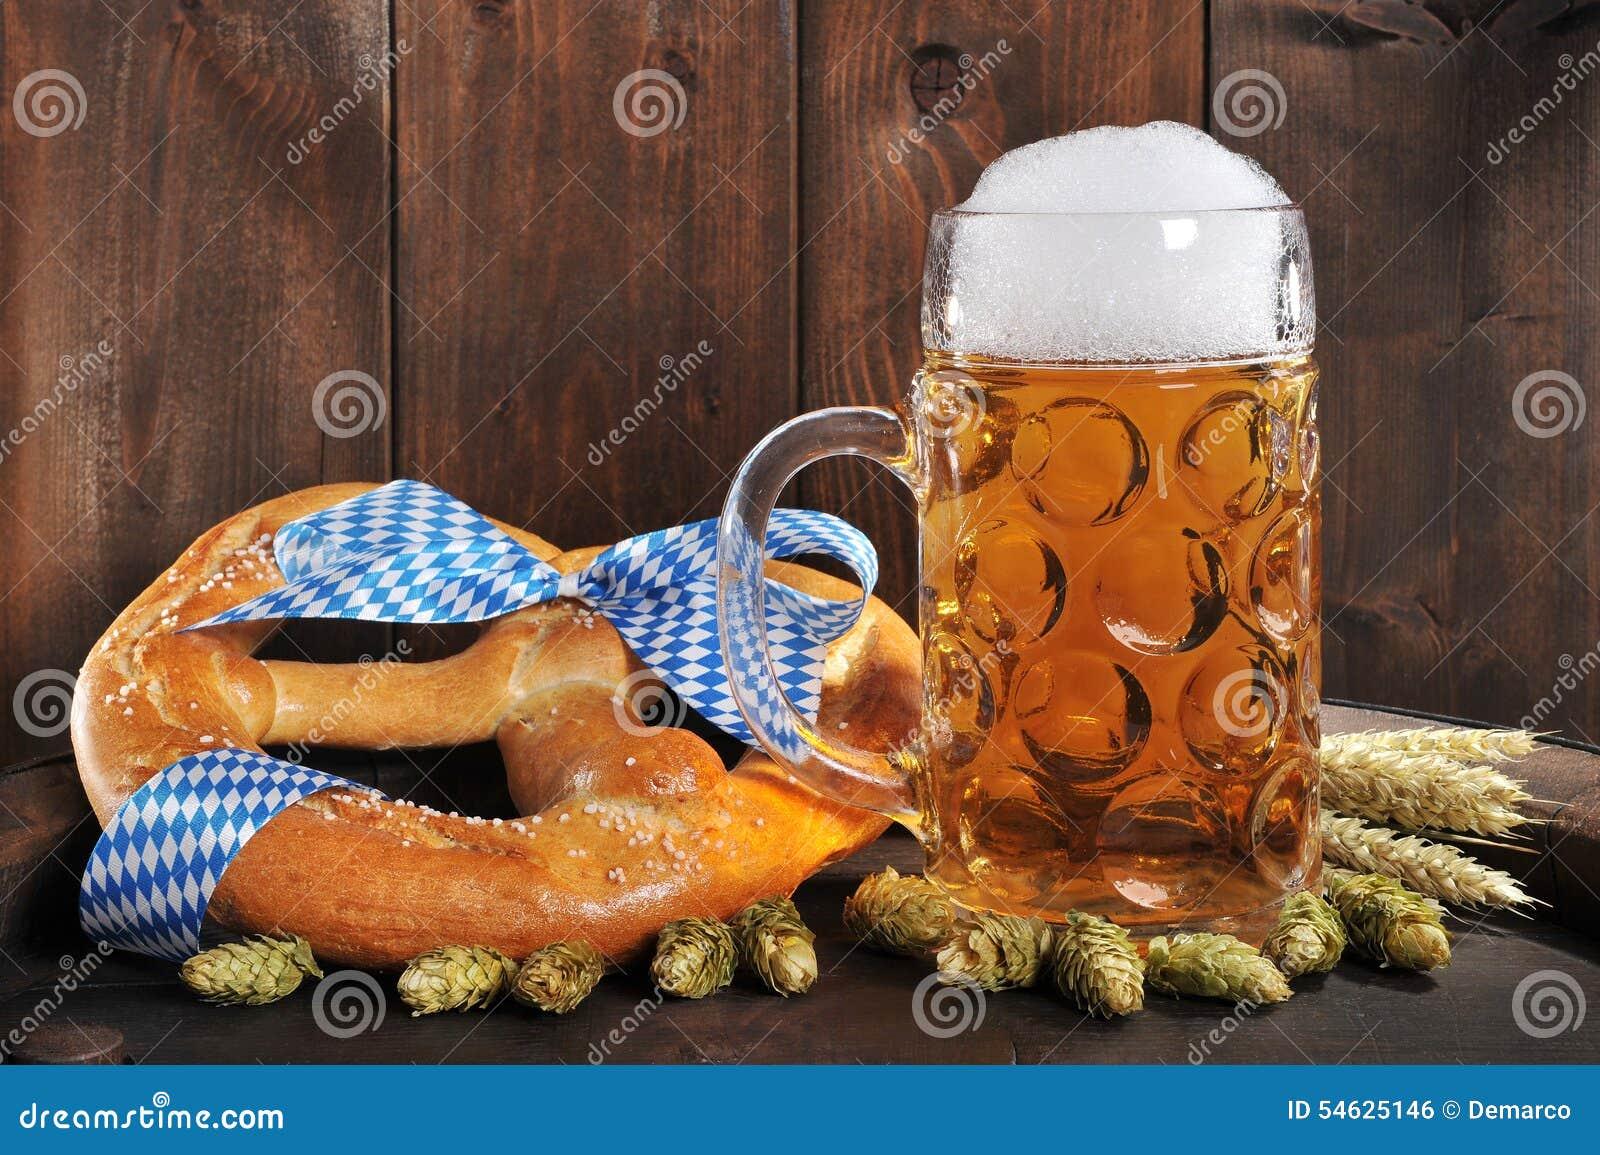 Bavarian Oktoberfest soft pretzel with beer